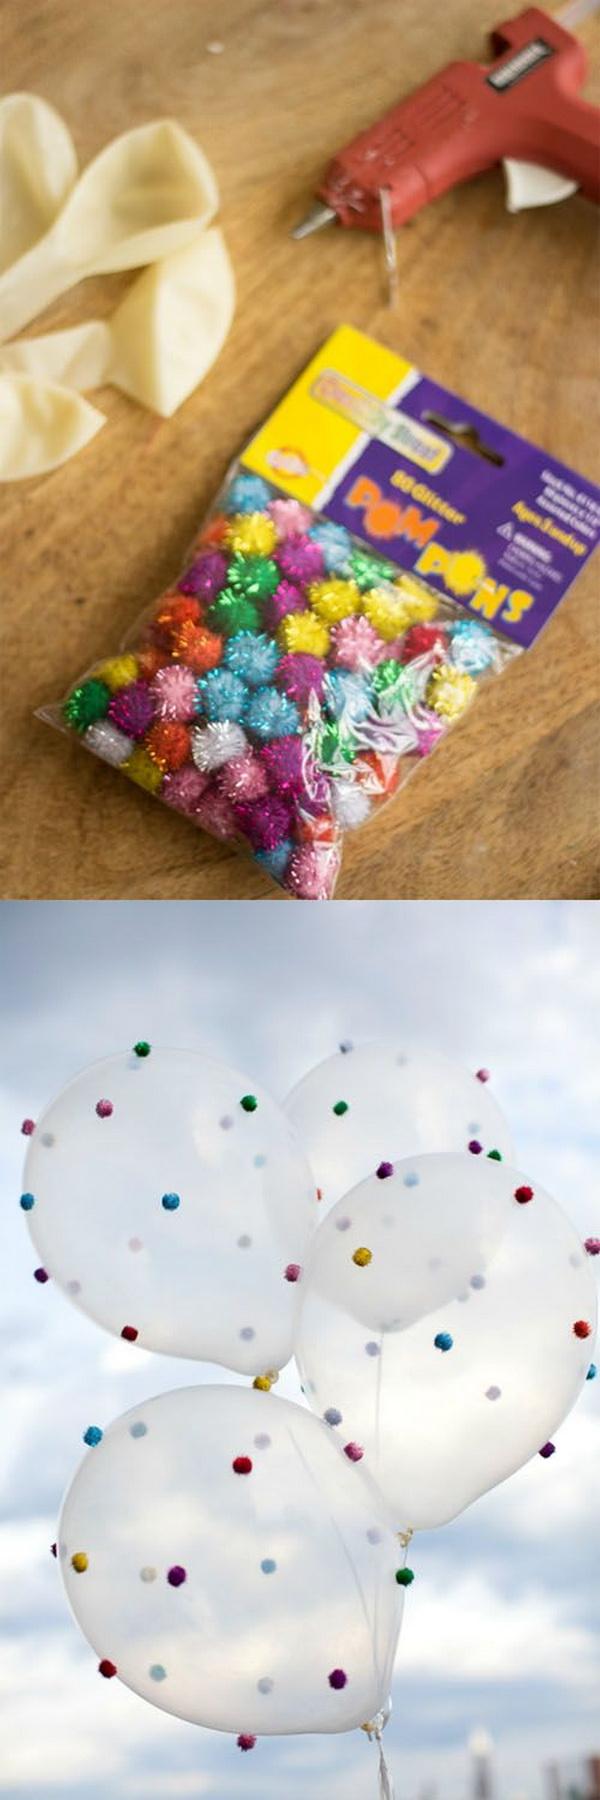 Mini Pom Pom Decorated Balloons.